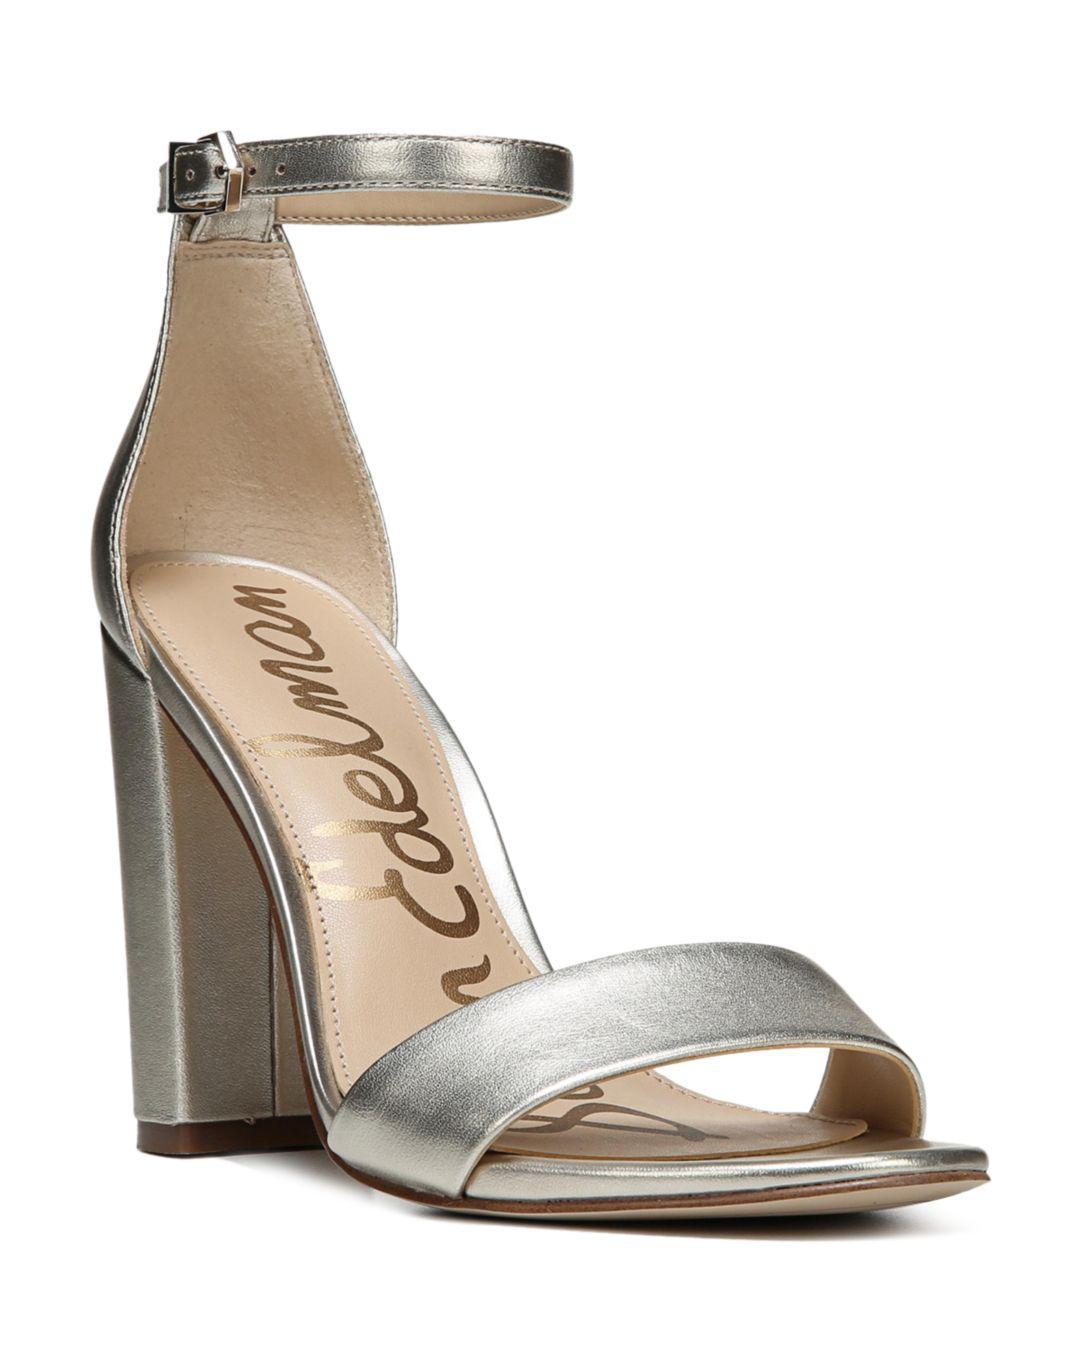 81d6413280b Lyst - Sam Edelman Yaro Ankle Strap Block Heel Sandals in Metallic ...